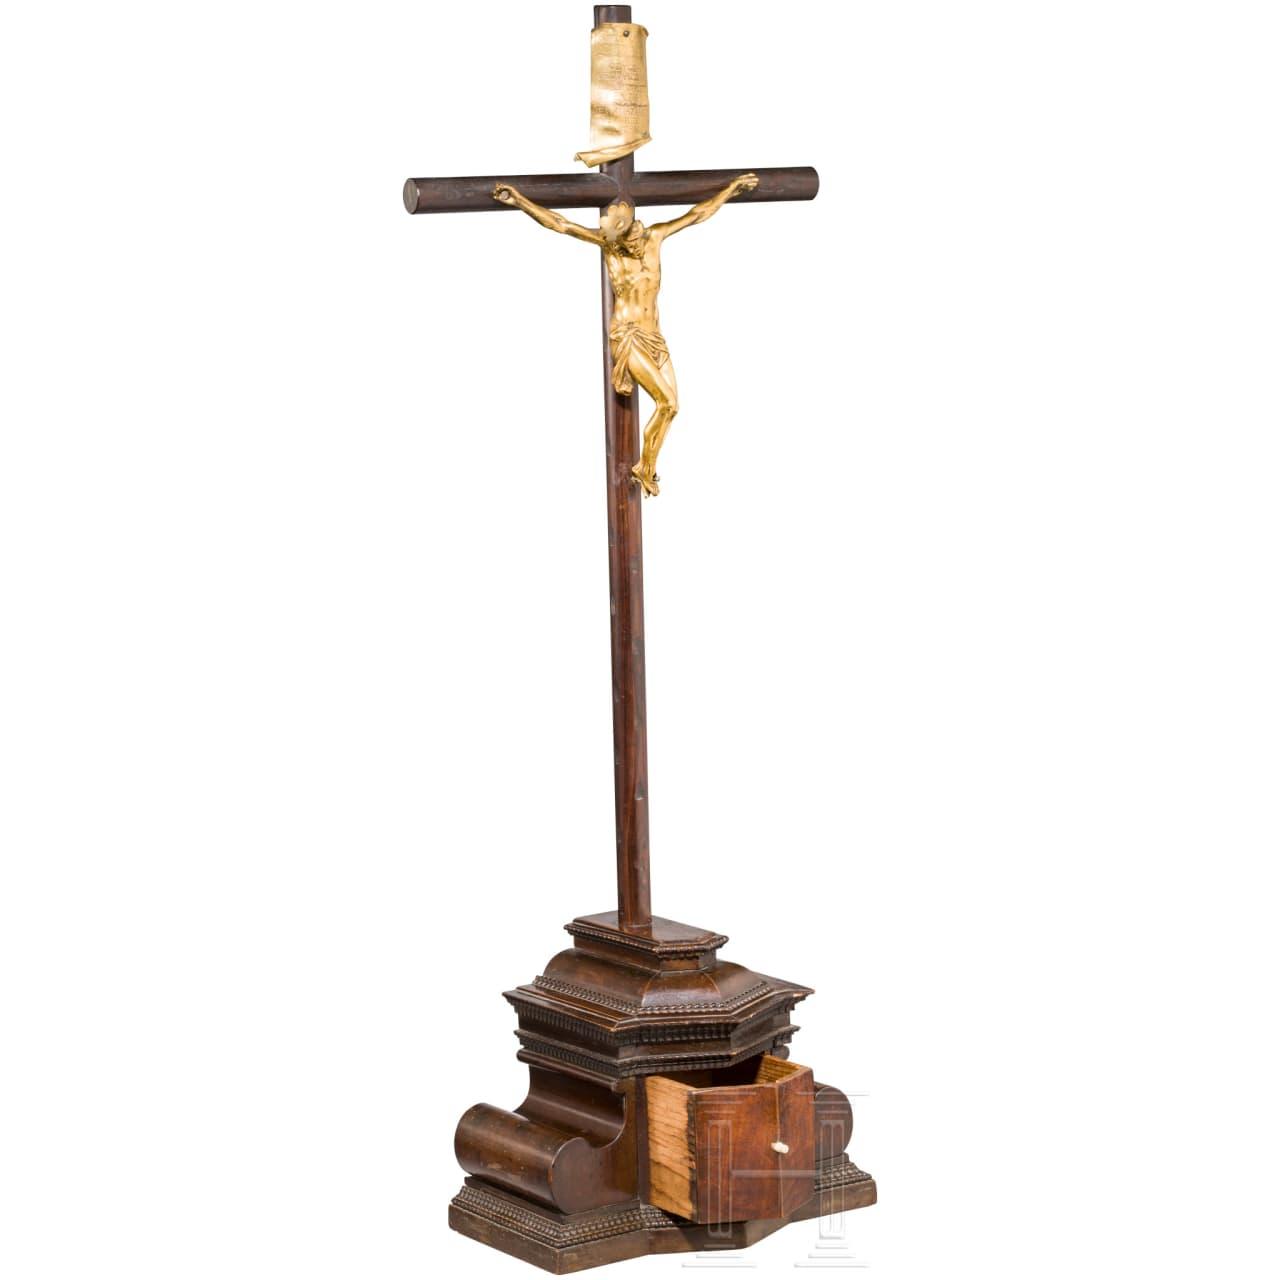 Kruzifix mit vergoldetem Christuskorpus, Augsburg, Mitte 17. Jhdt.